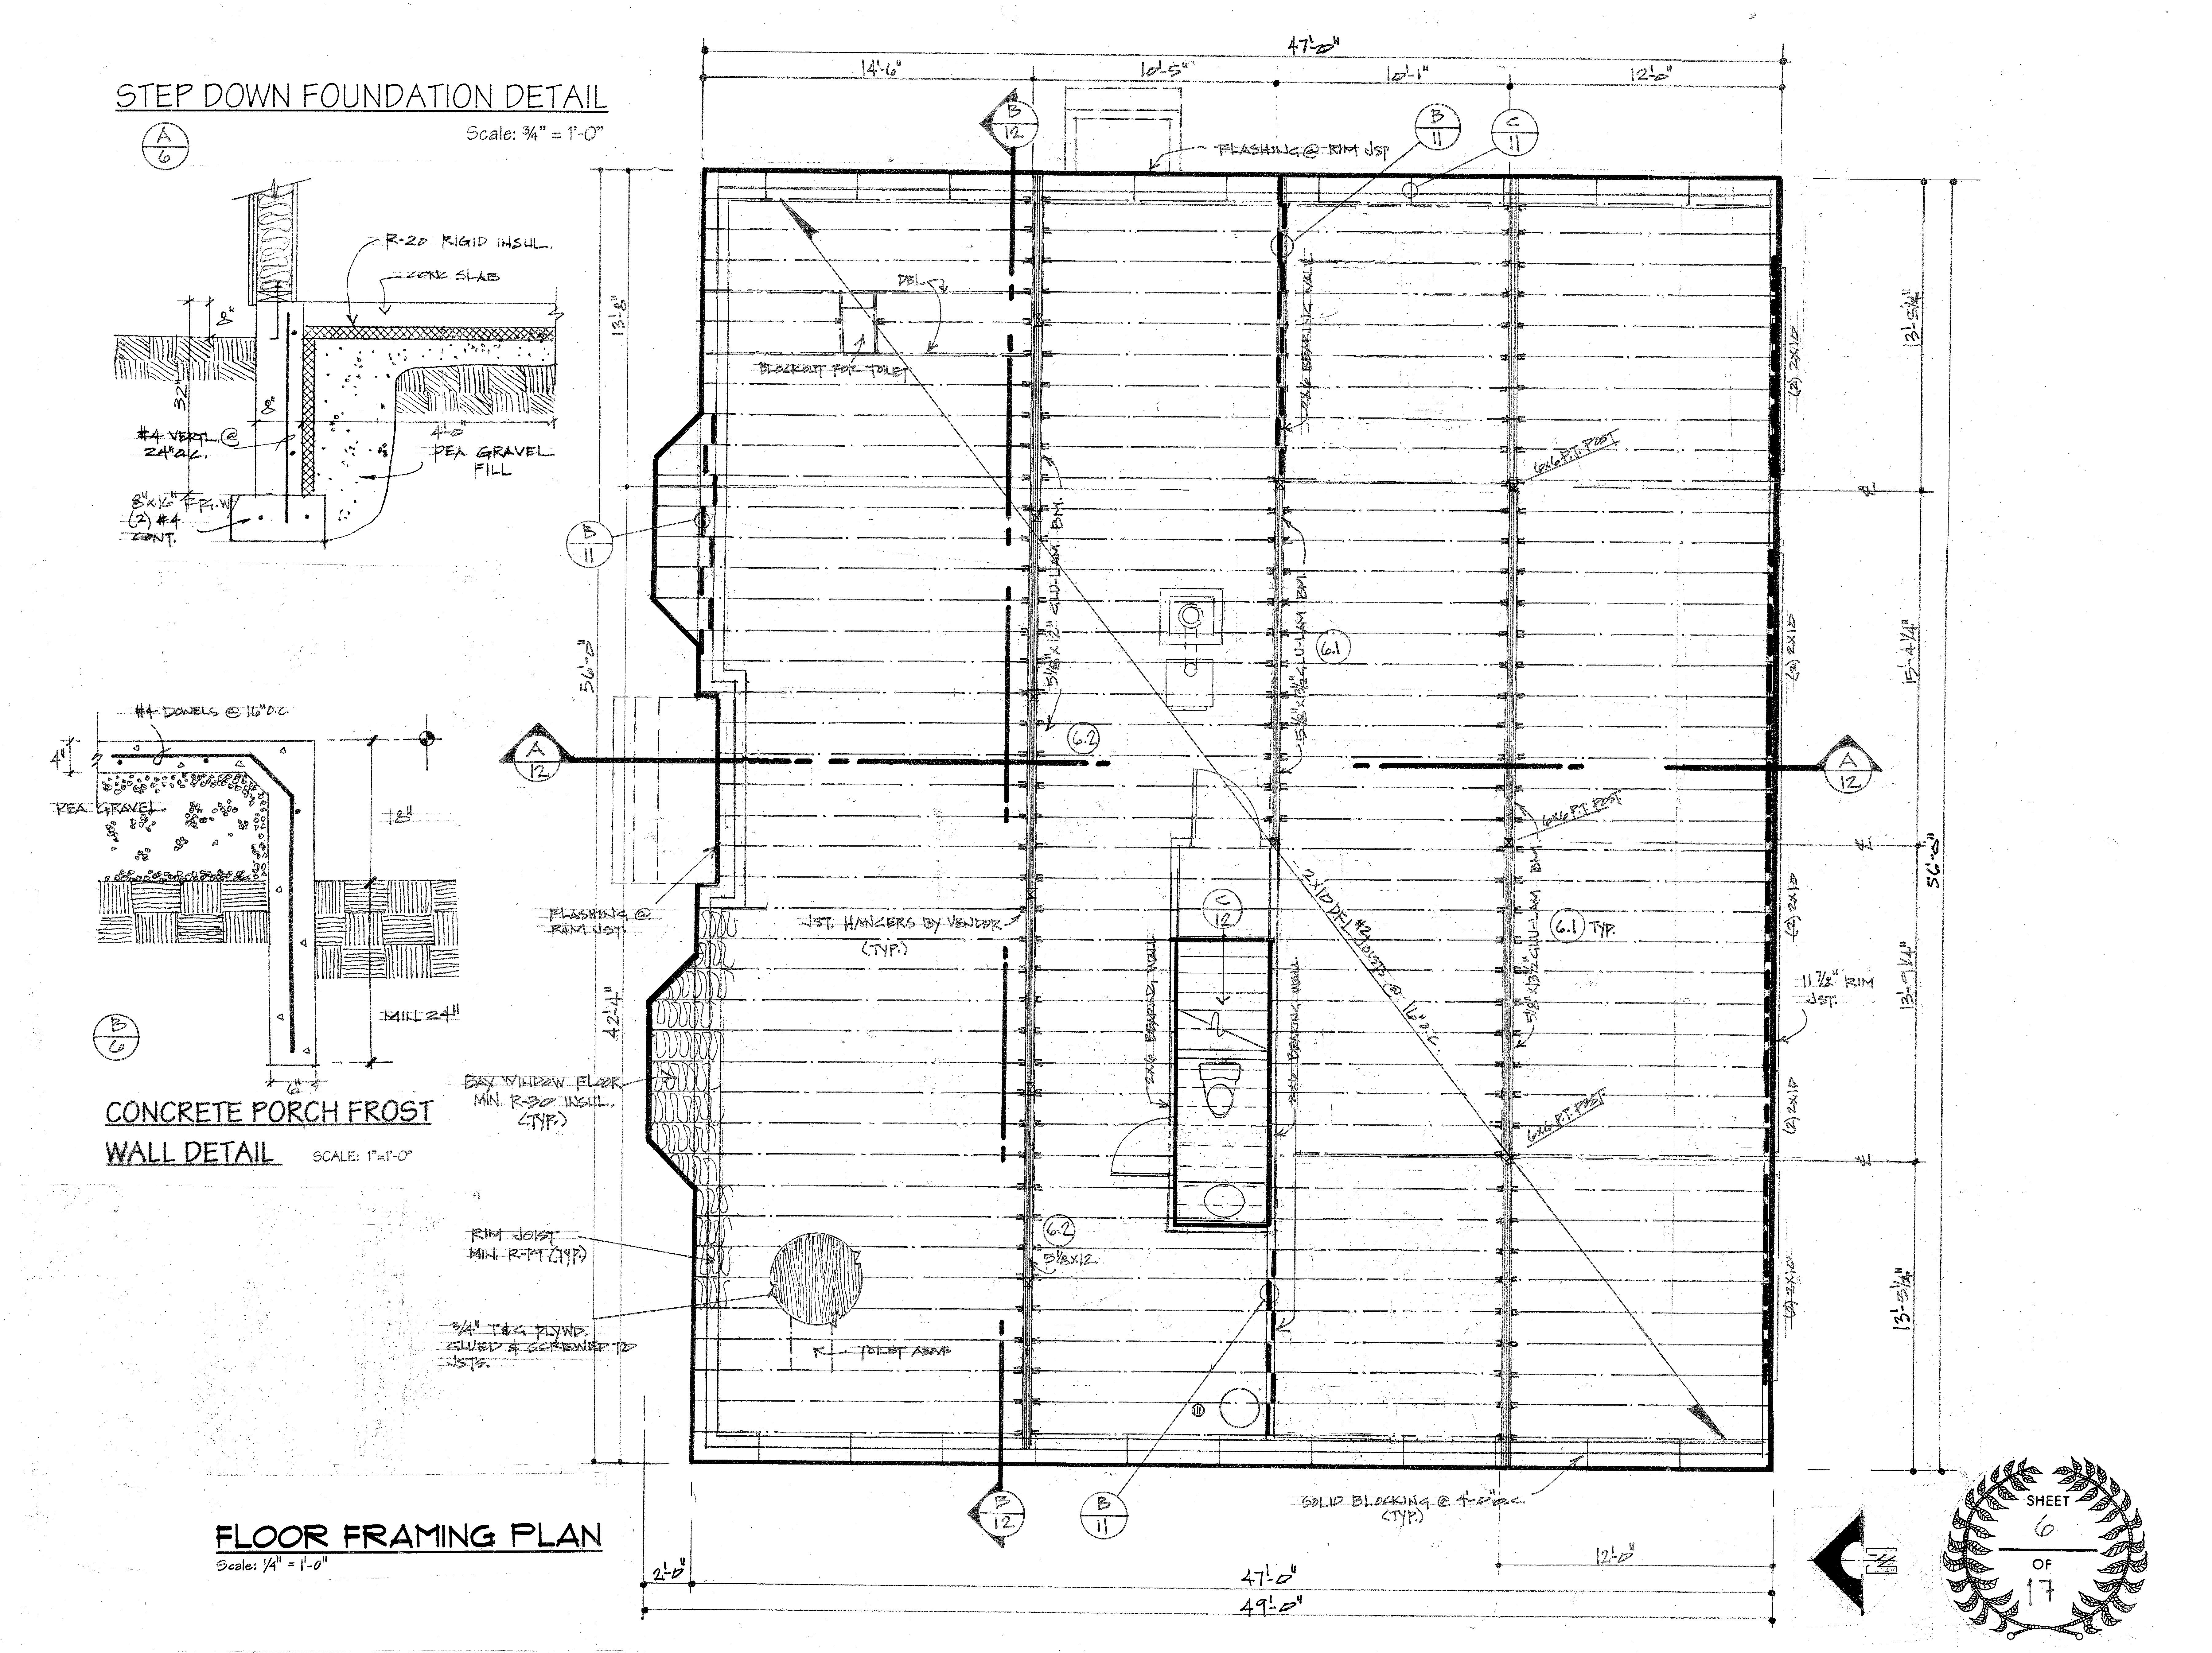 Sample Plans - The Plan Shoppe